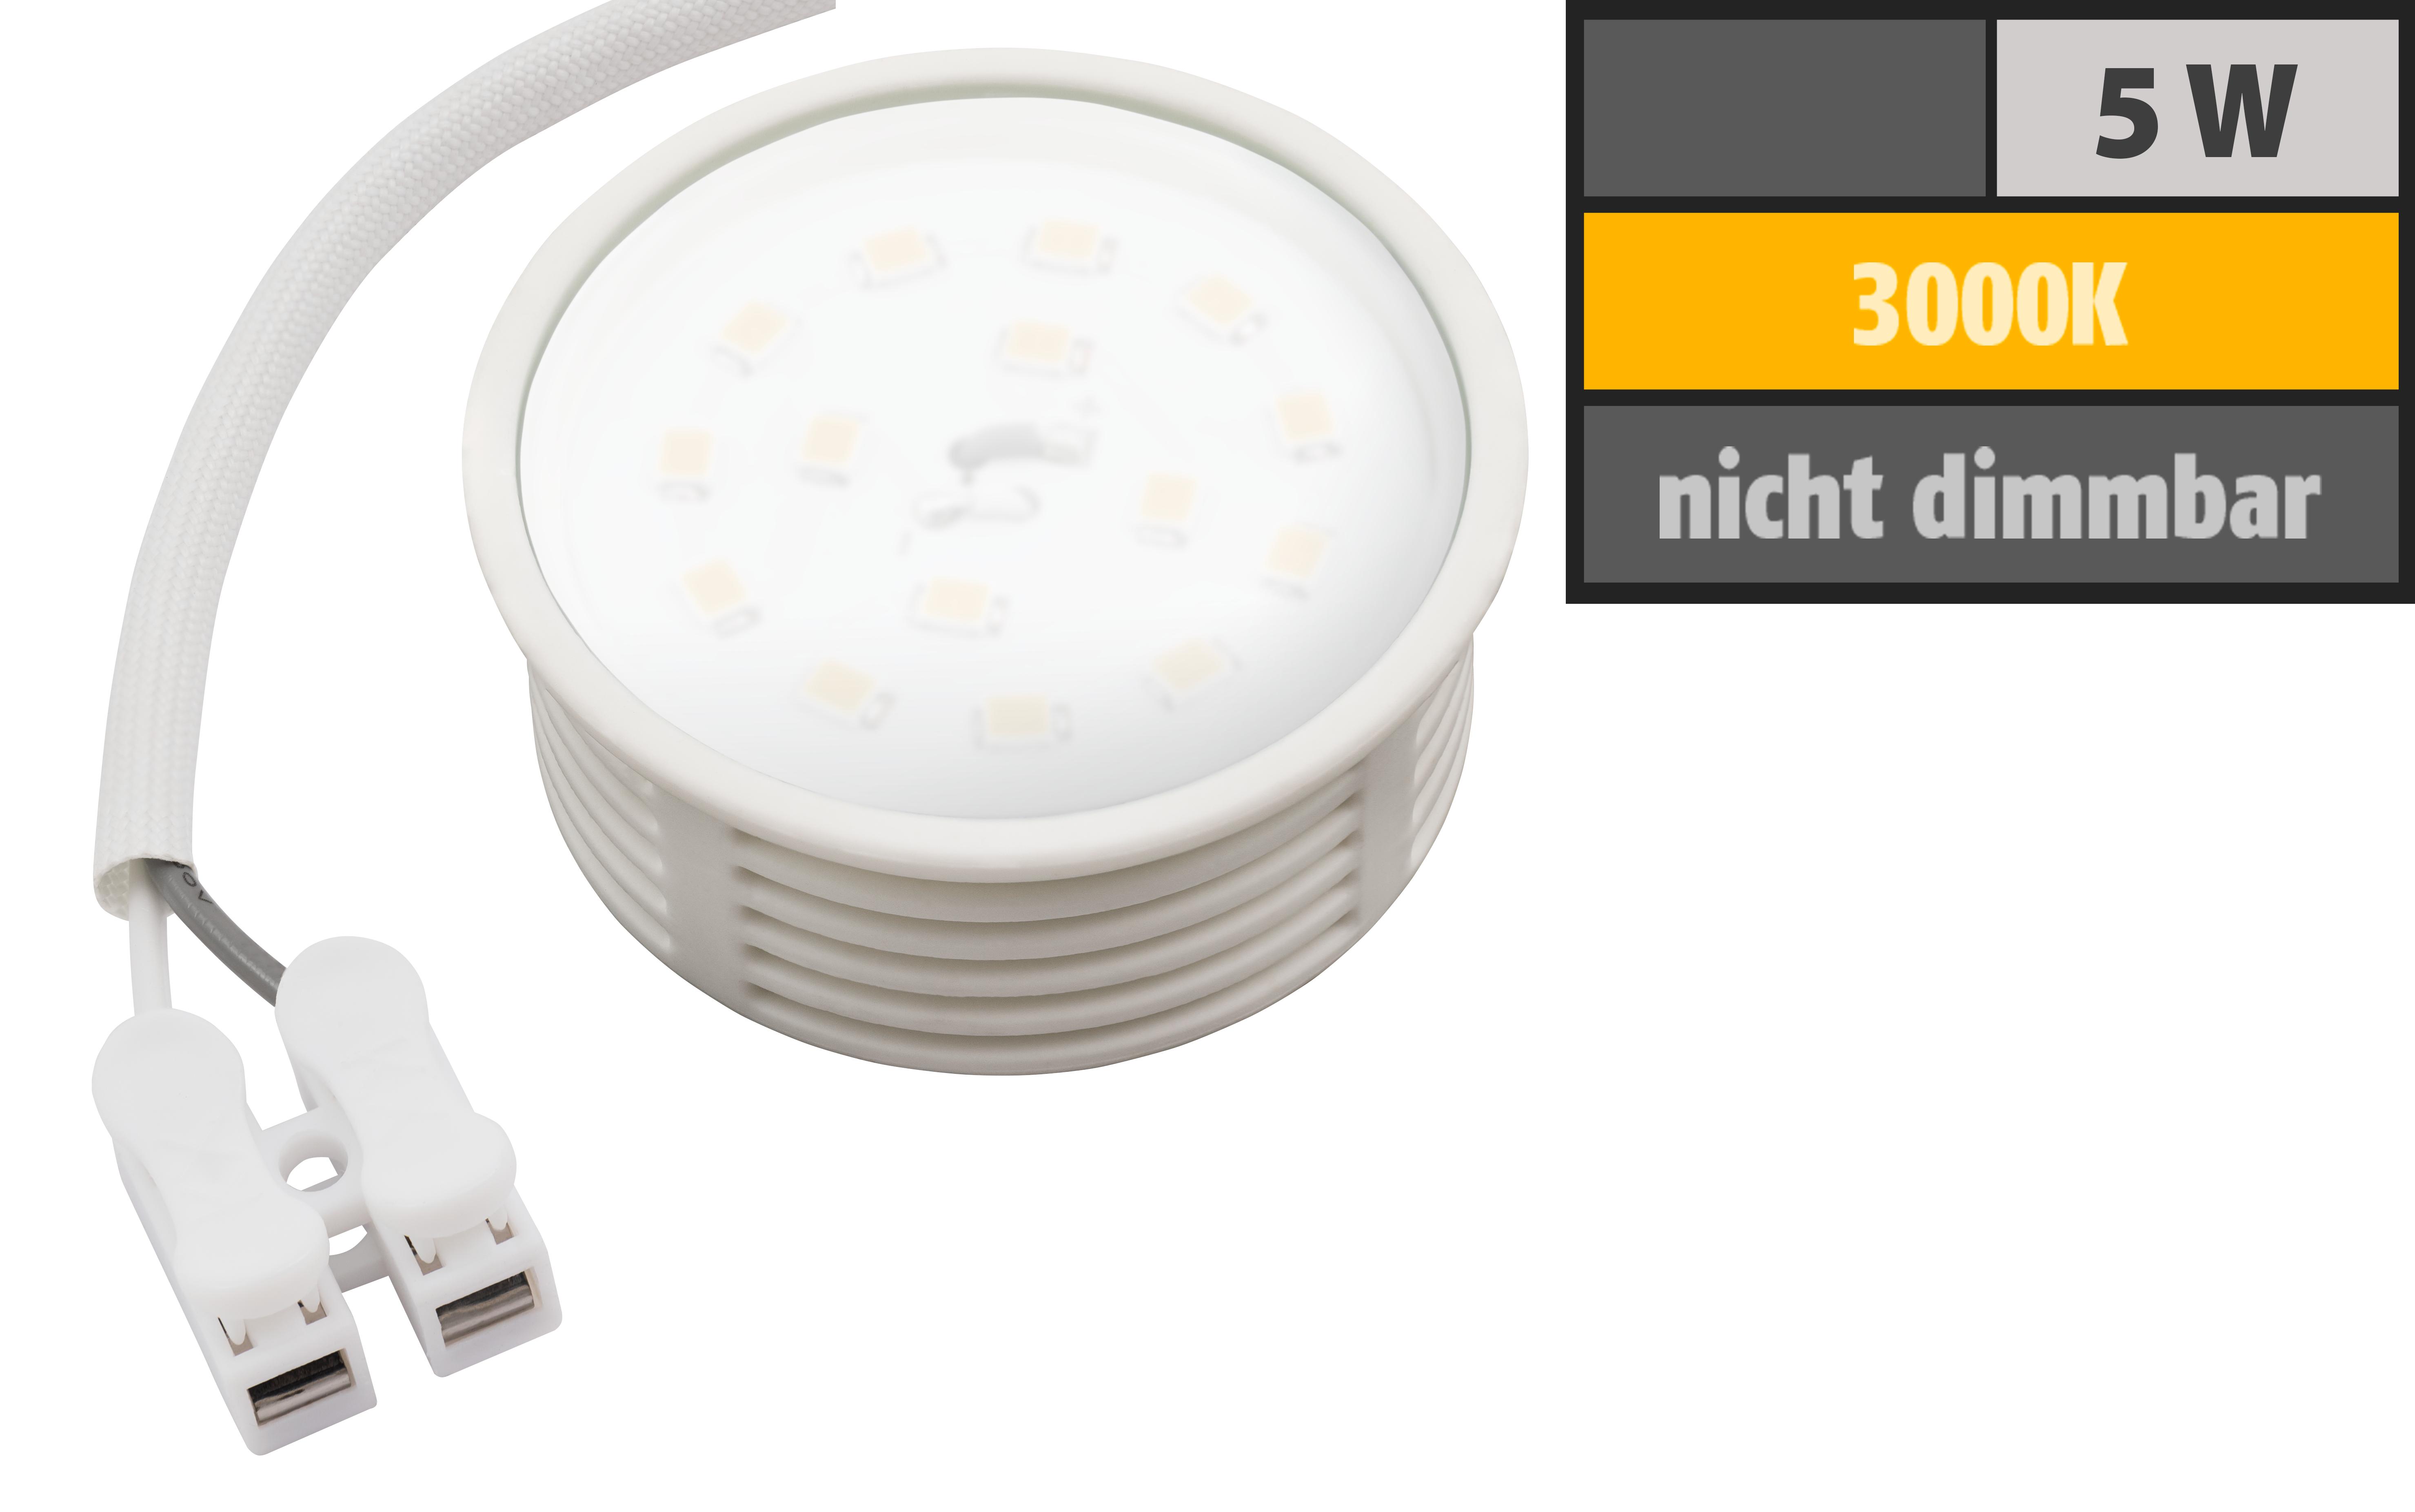 led modul mcshine 5w 400 lumen 230v 50x23mm warmwei 3000k ett der elektronik und. Black Bedroom Furniture Sets. Home Design Ideas